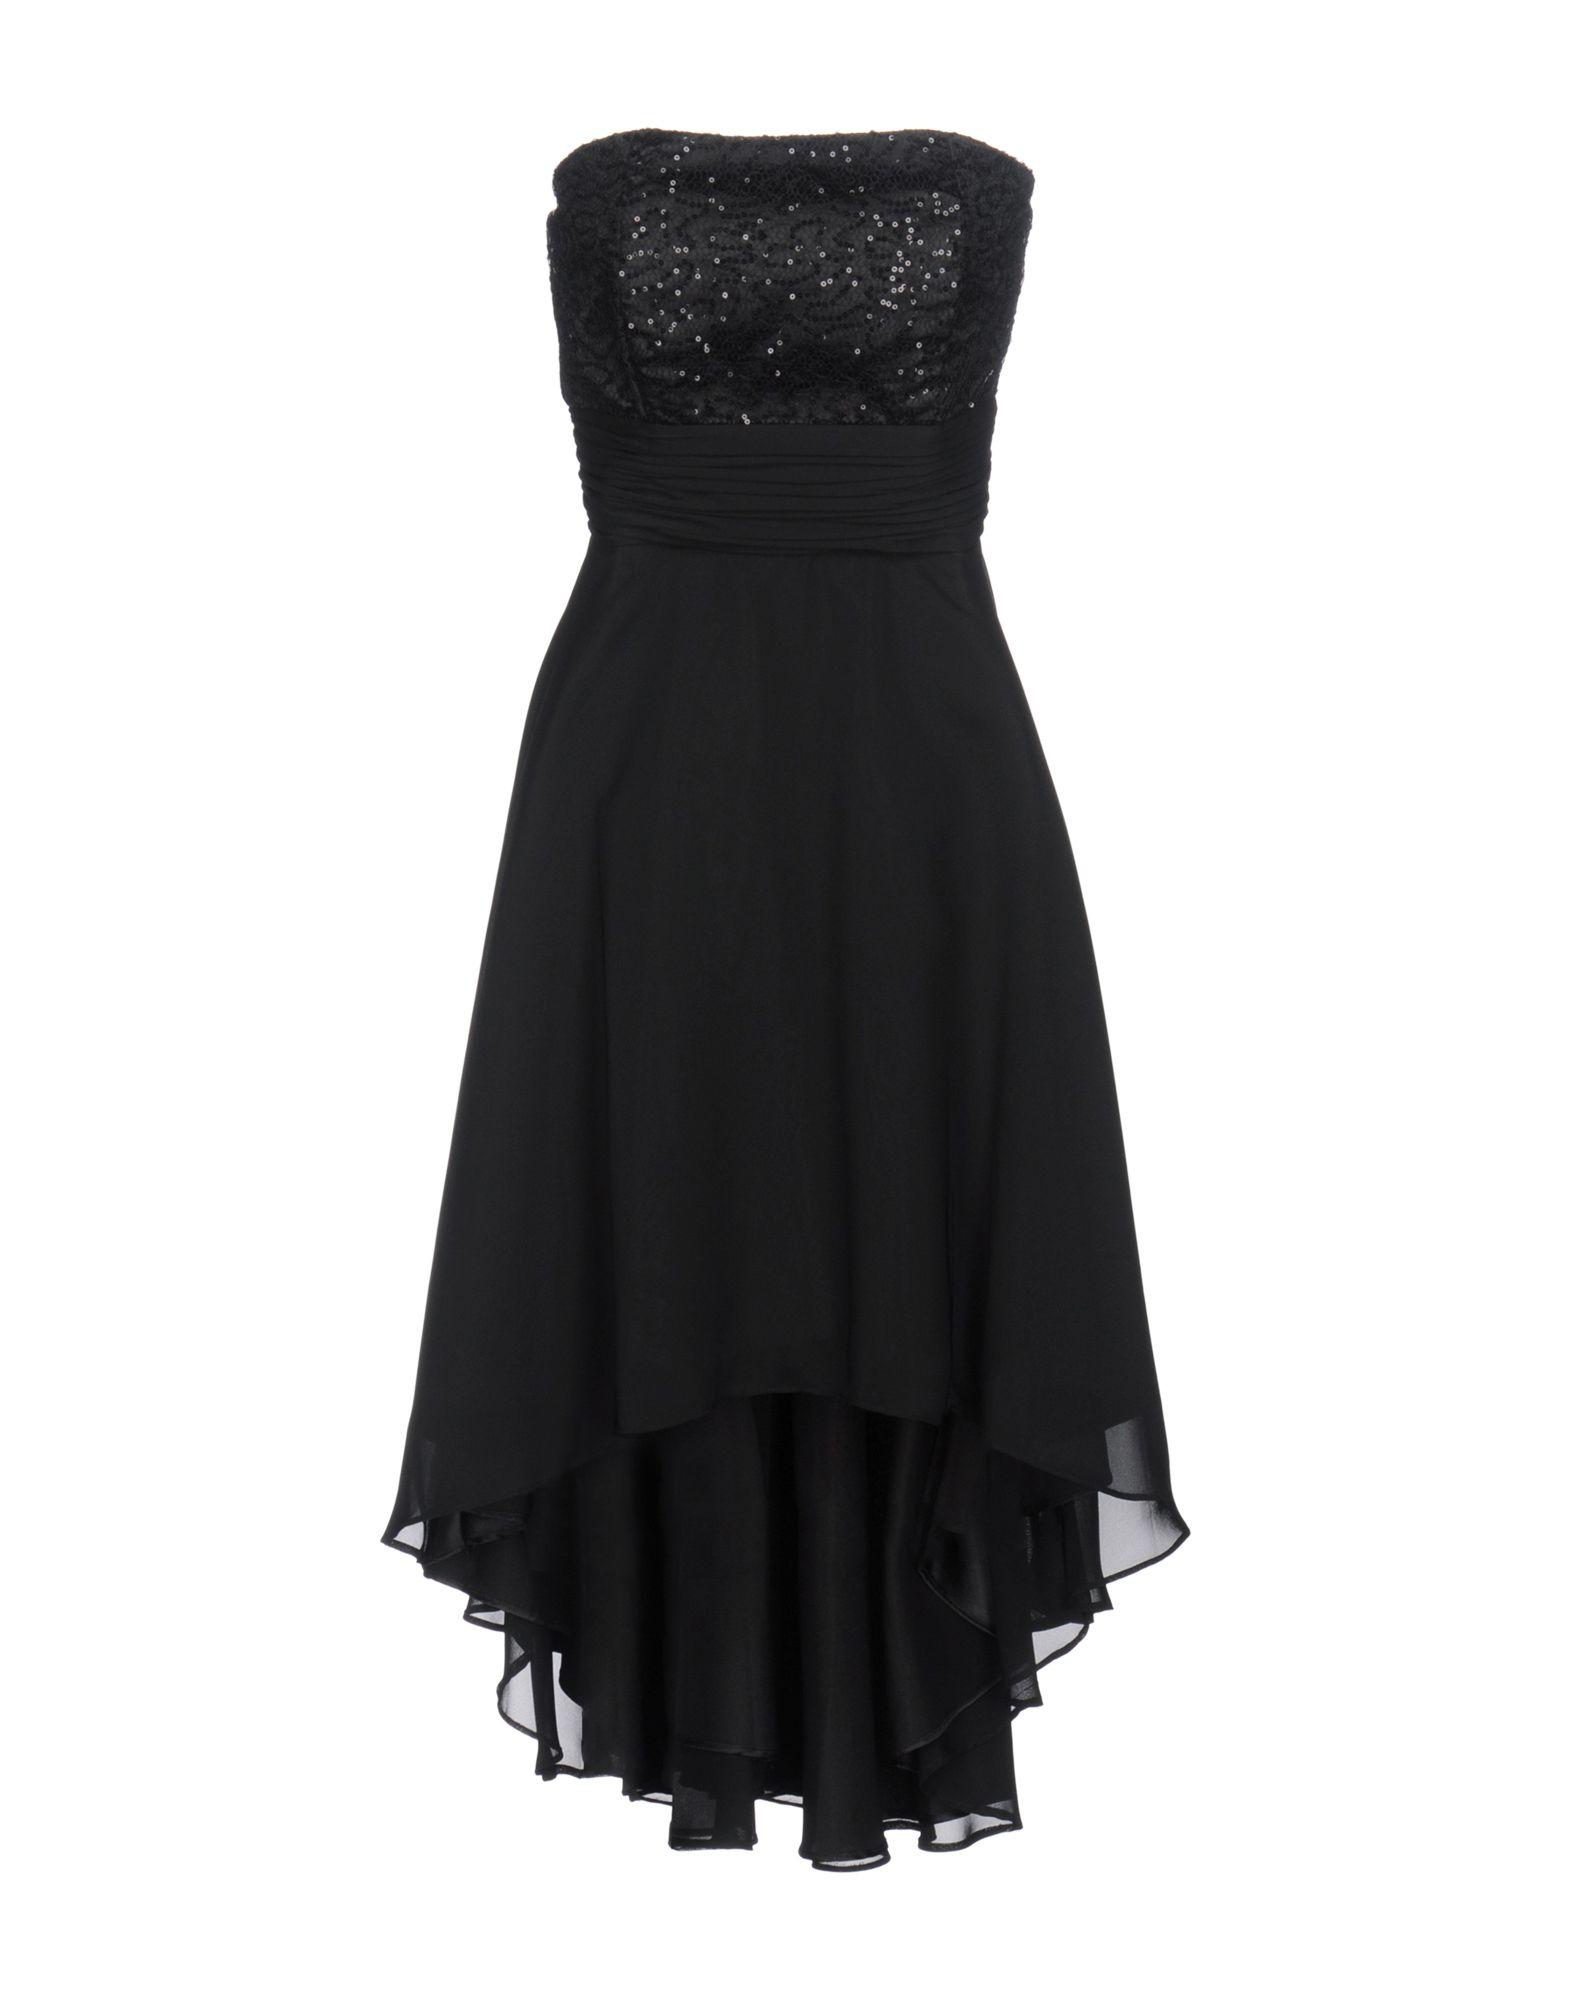 MY SECRET BLACK DRESS Платье до колена my secret place a gorjuss guided journal hb